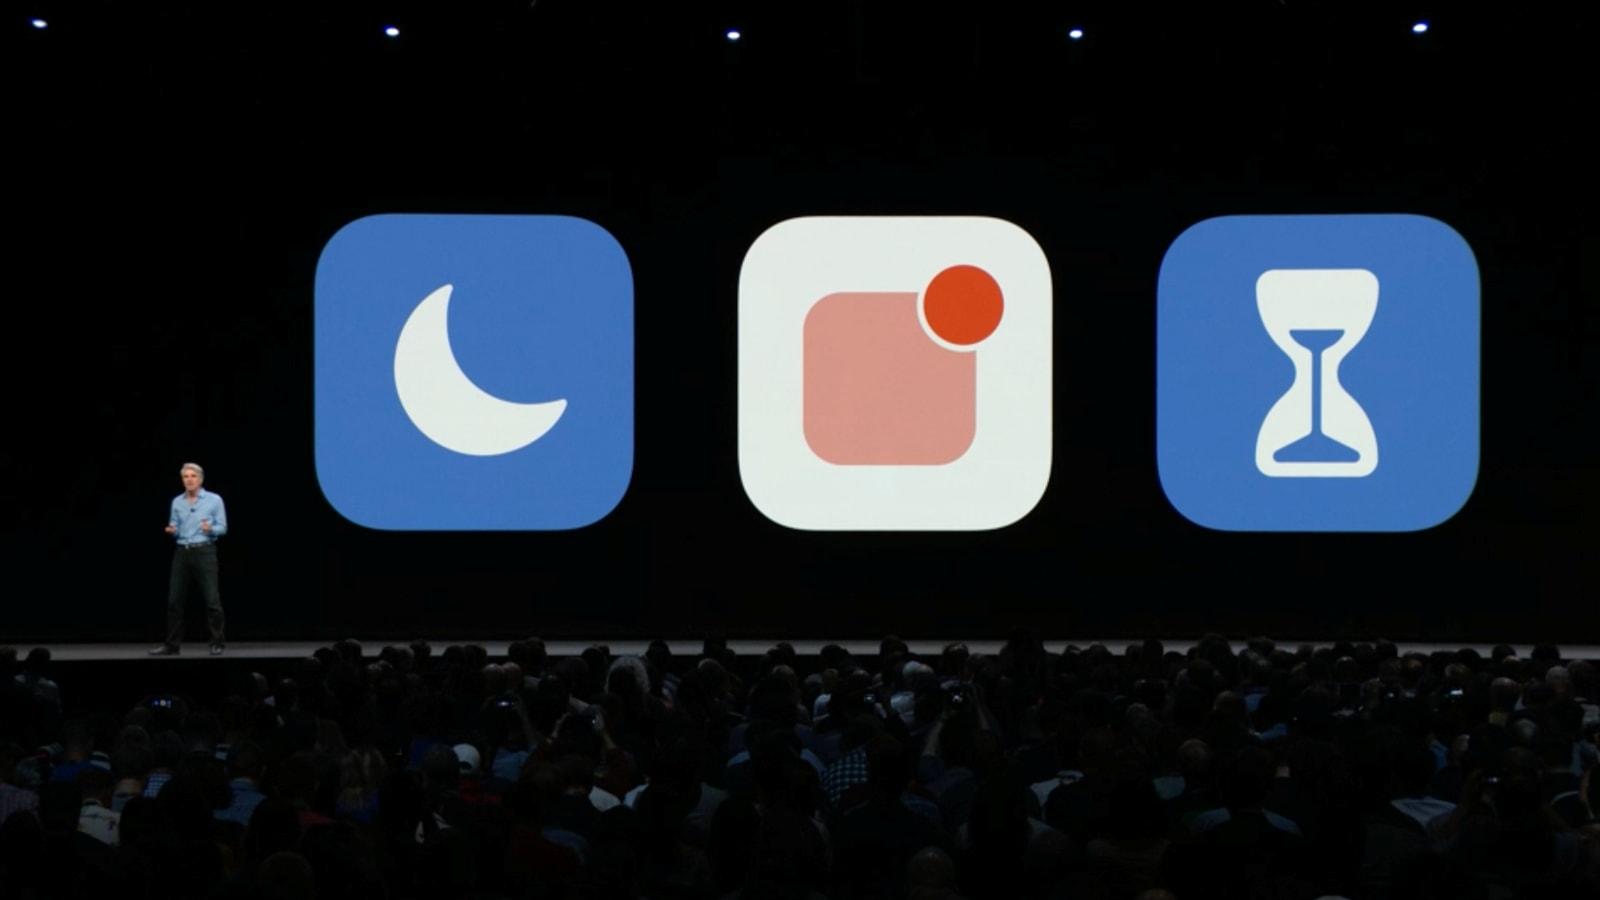 Notifications: કંપનીએ લોક સ્ક્રિનમાં નોટિફિકેશન્સને ટ્યૂન કરવાનો વિકલ્પ આપ્યો છે. નવા iOS 12માં ગ્રુપ નોટિફિકેશન સપોર્ટ રજૂ કરવામાં આવ્યો છે.